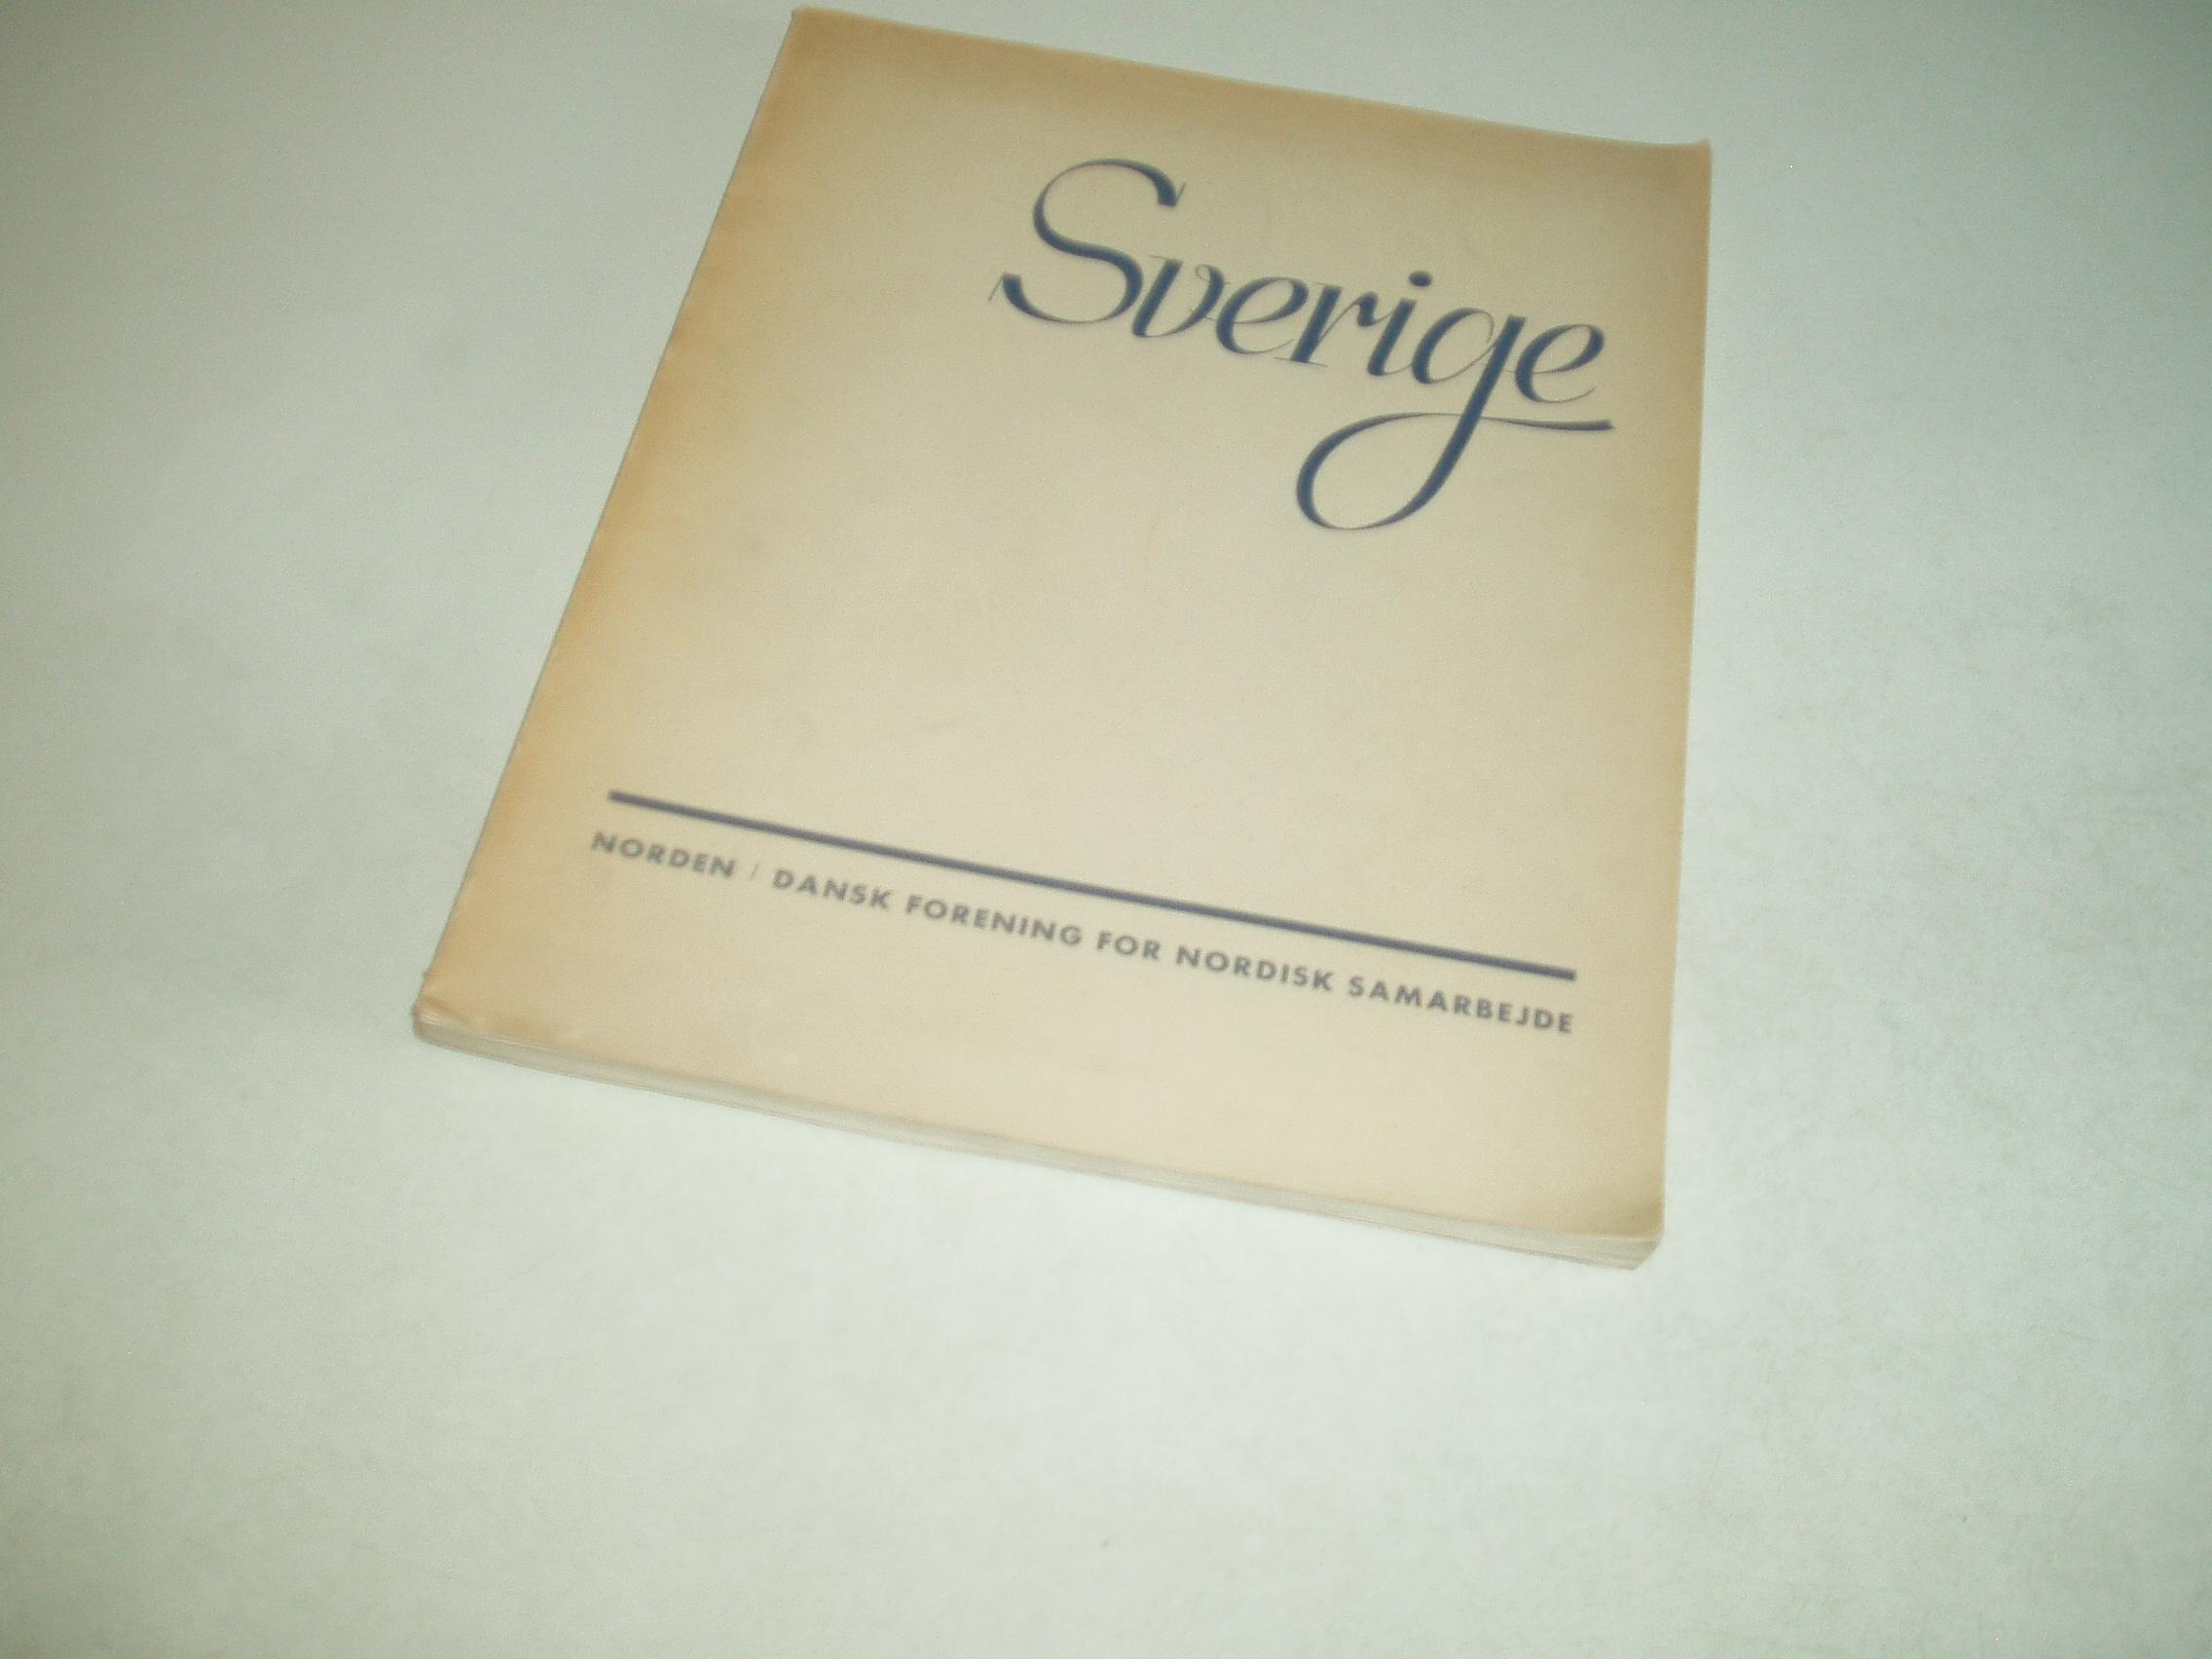 Sverige. Svenska bilder utgivna av Norden